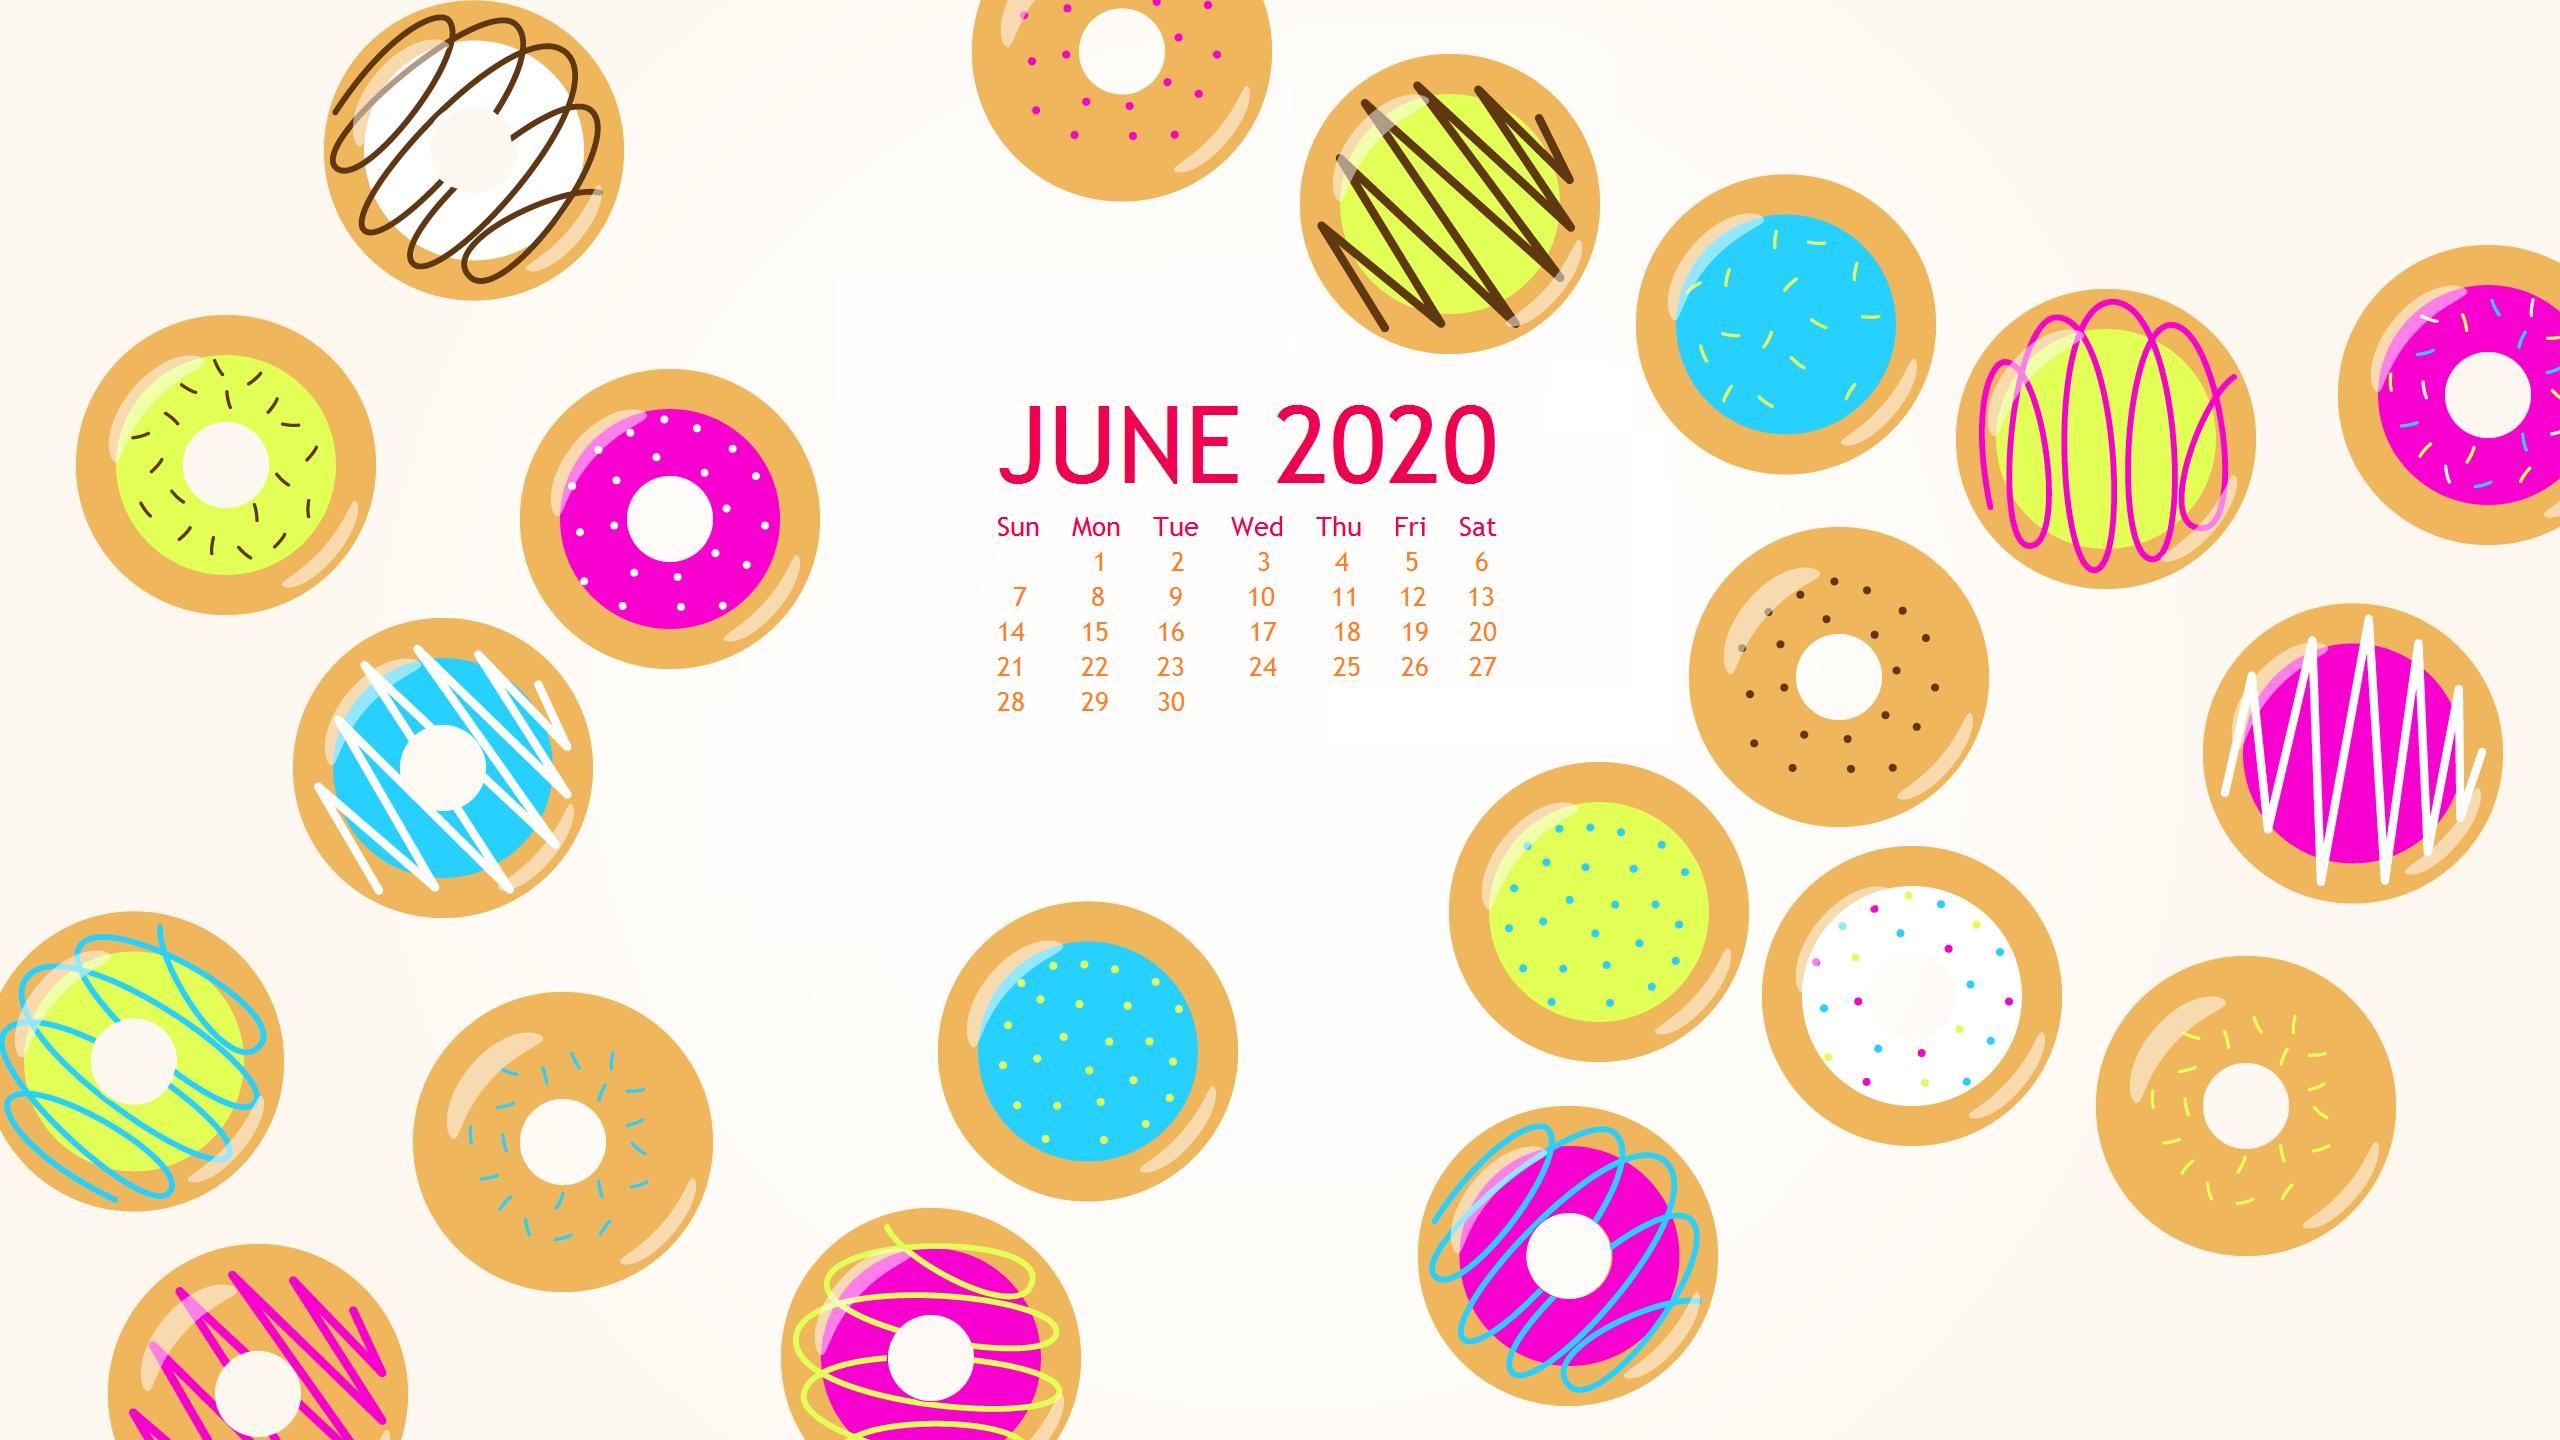 June 2020 HD Wallpaper